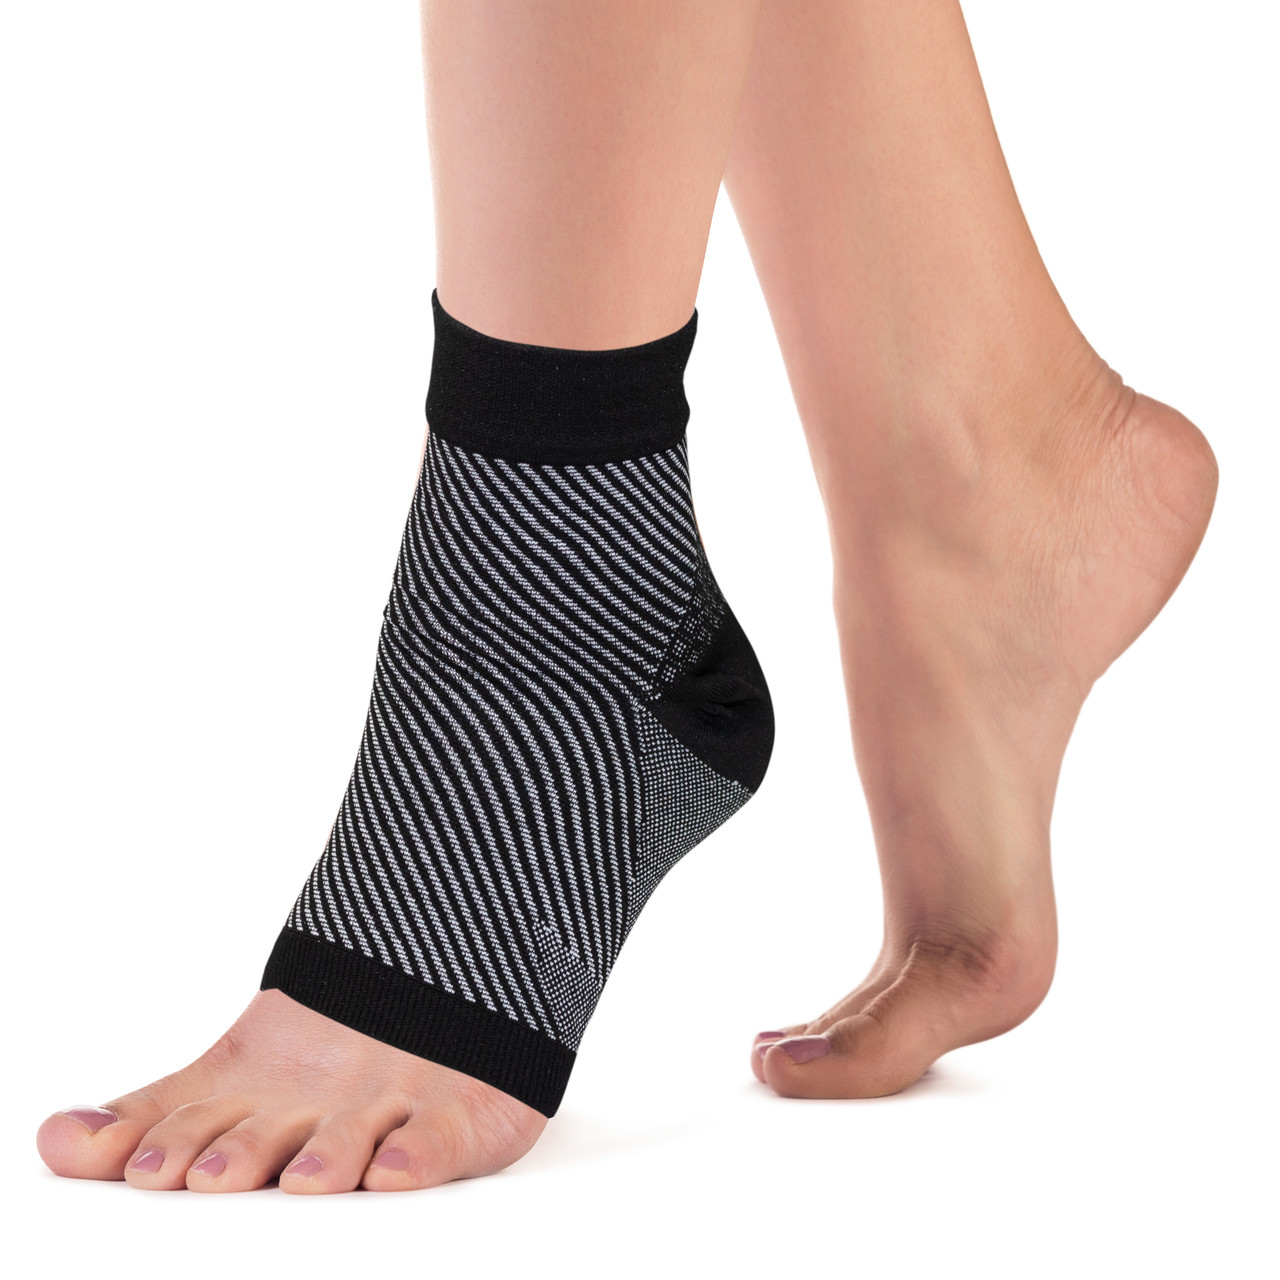 25504fae4c79f Plantar Fasciitis Compression Socks